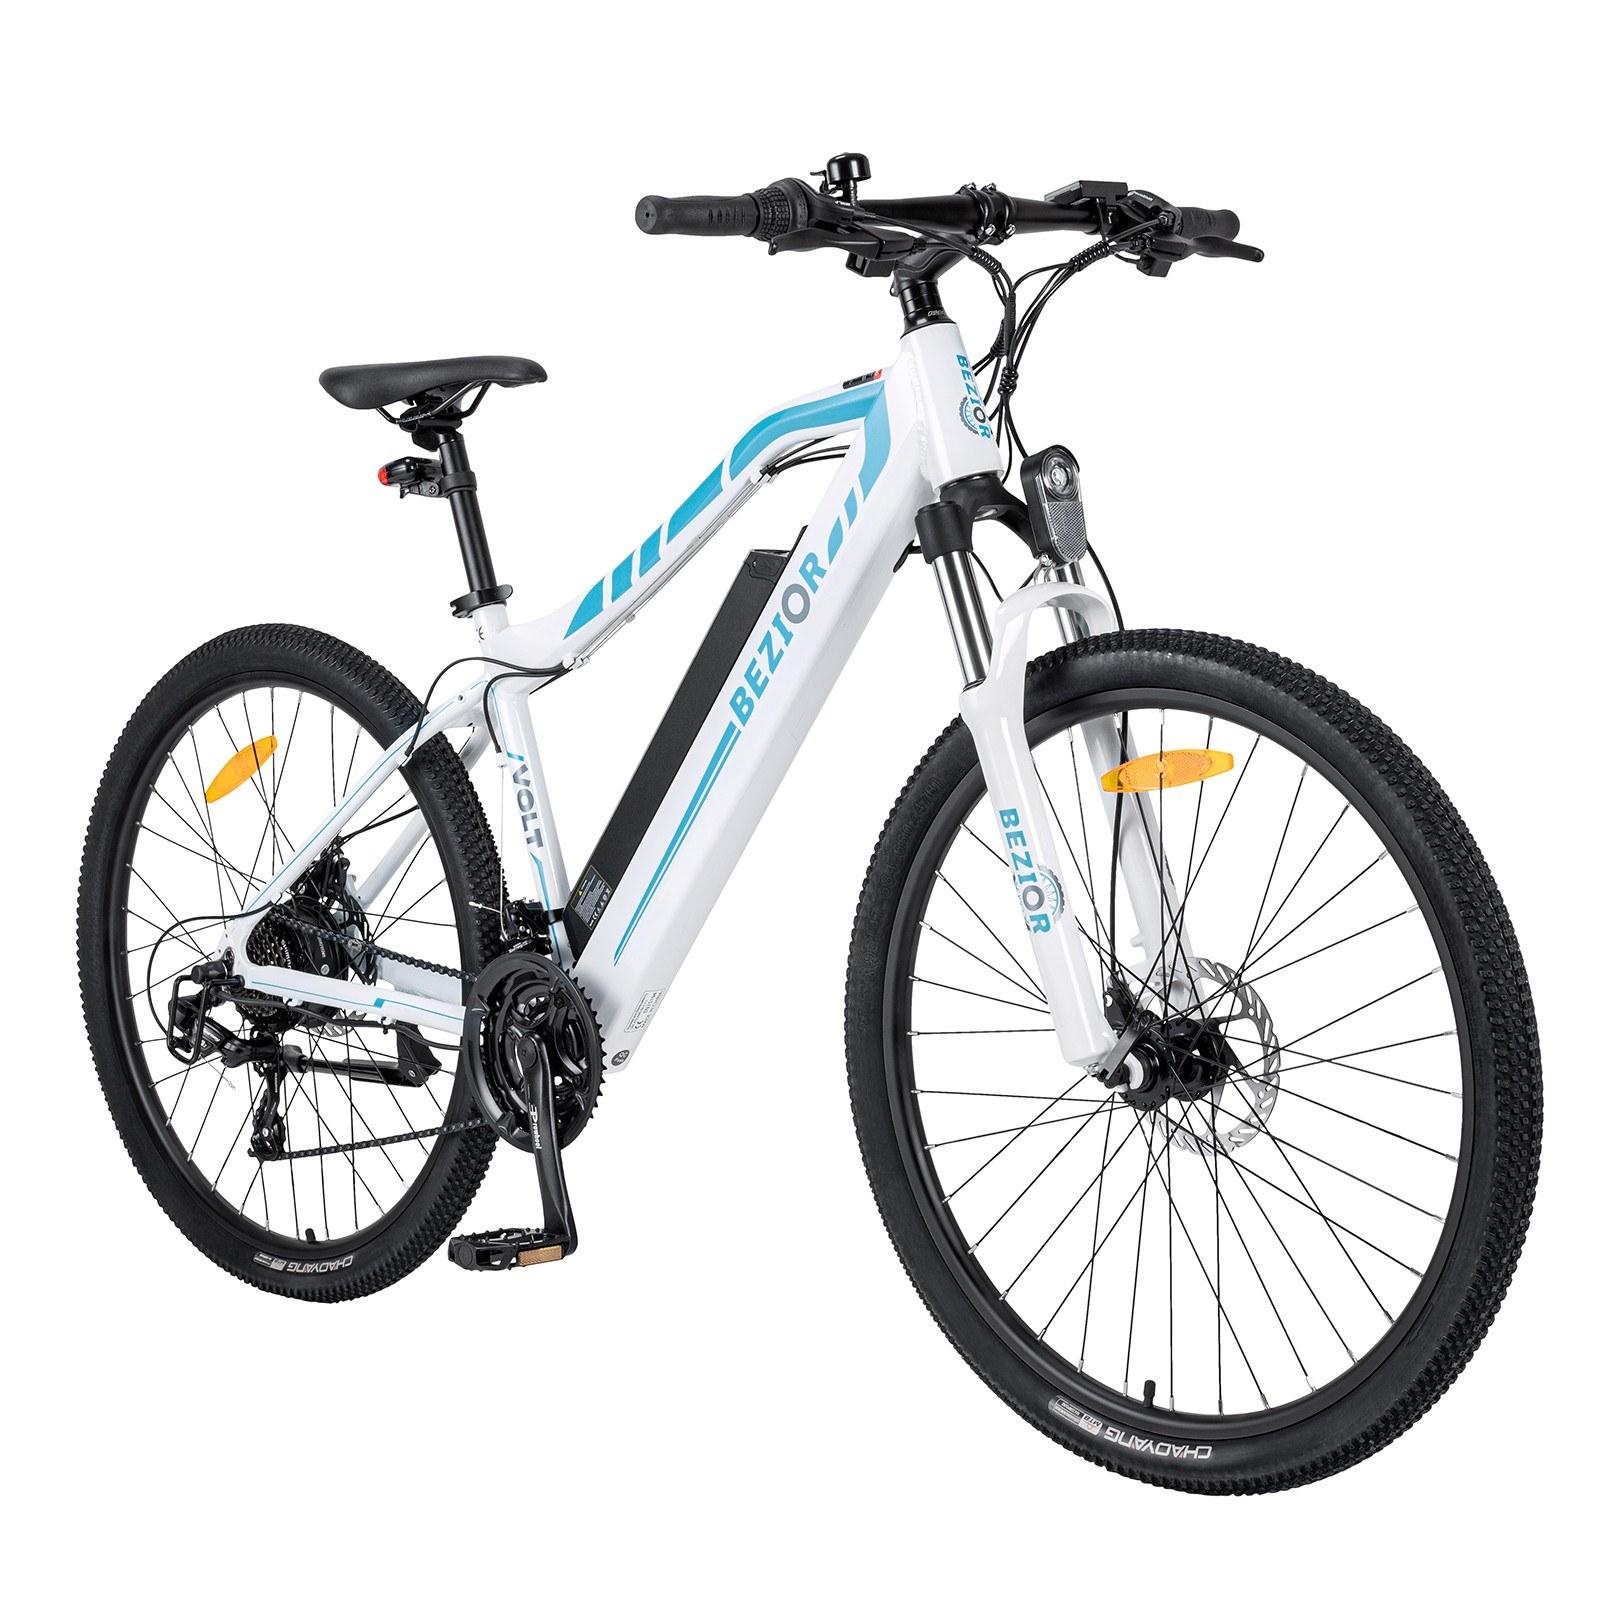 cafago.com - 56% OFF BEZIOR M1 27.5 Inch 250W Power Assist Electric Bike,free shipping+$1058.45